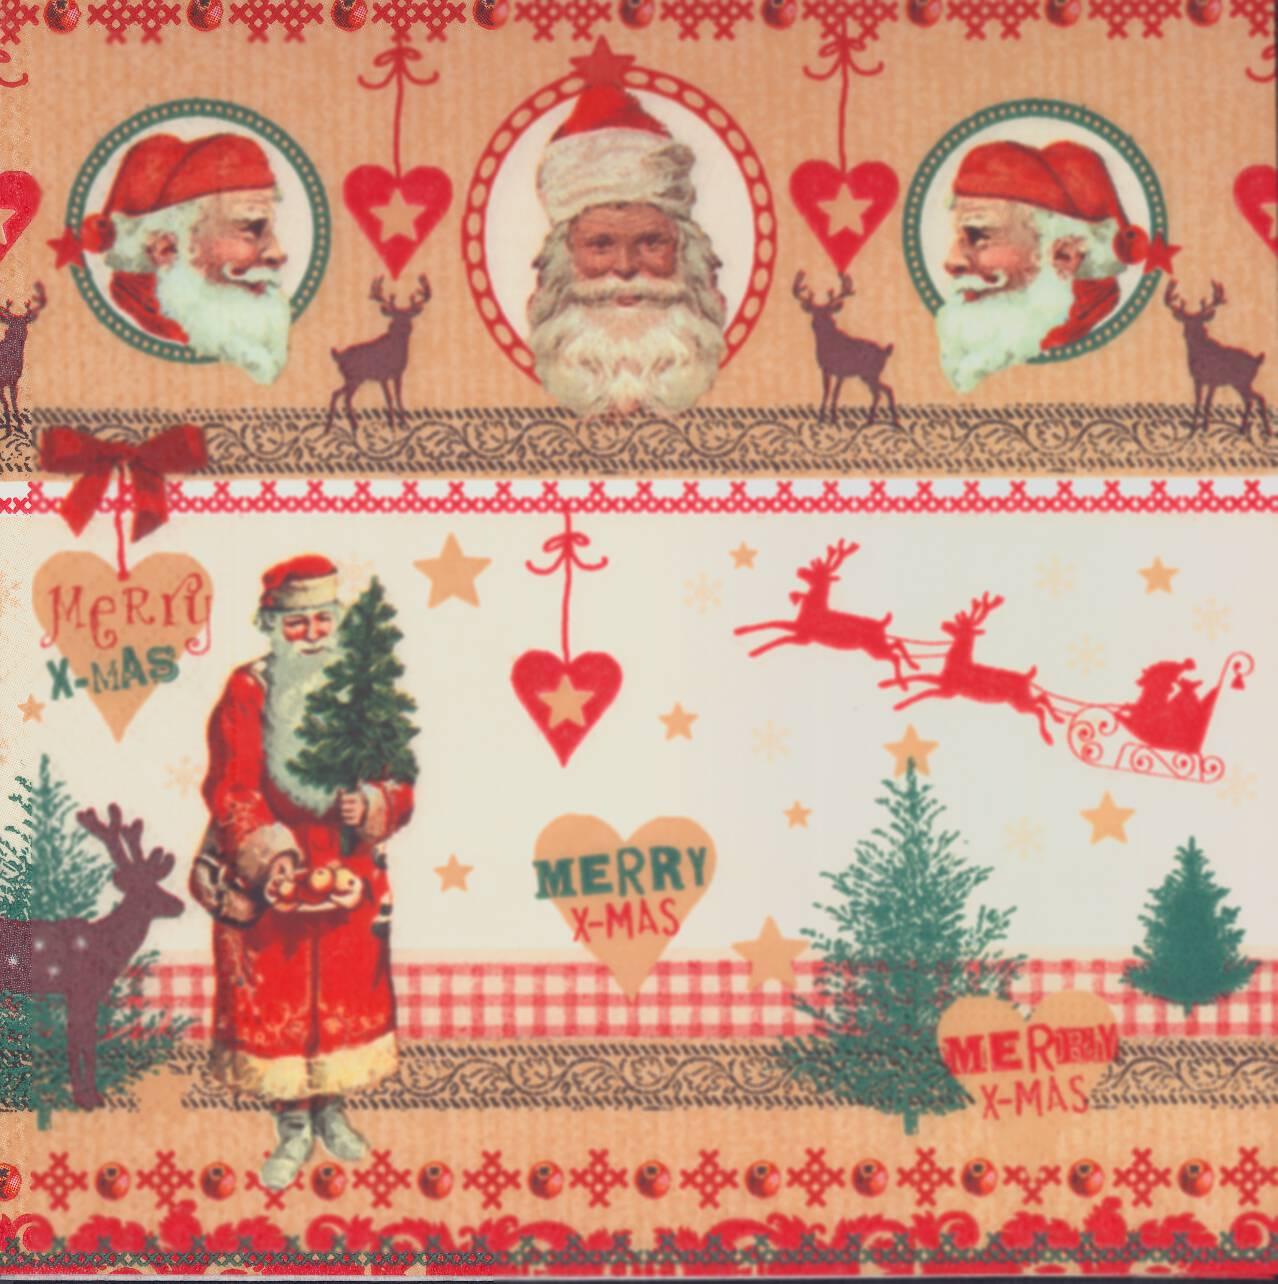 Christmas Napkins.Decoupage Paper Napkins Of Christmas With Santa Claus And Reindeer